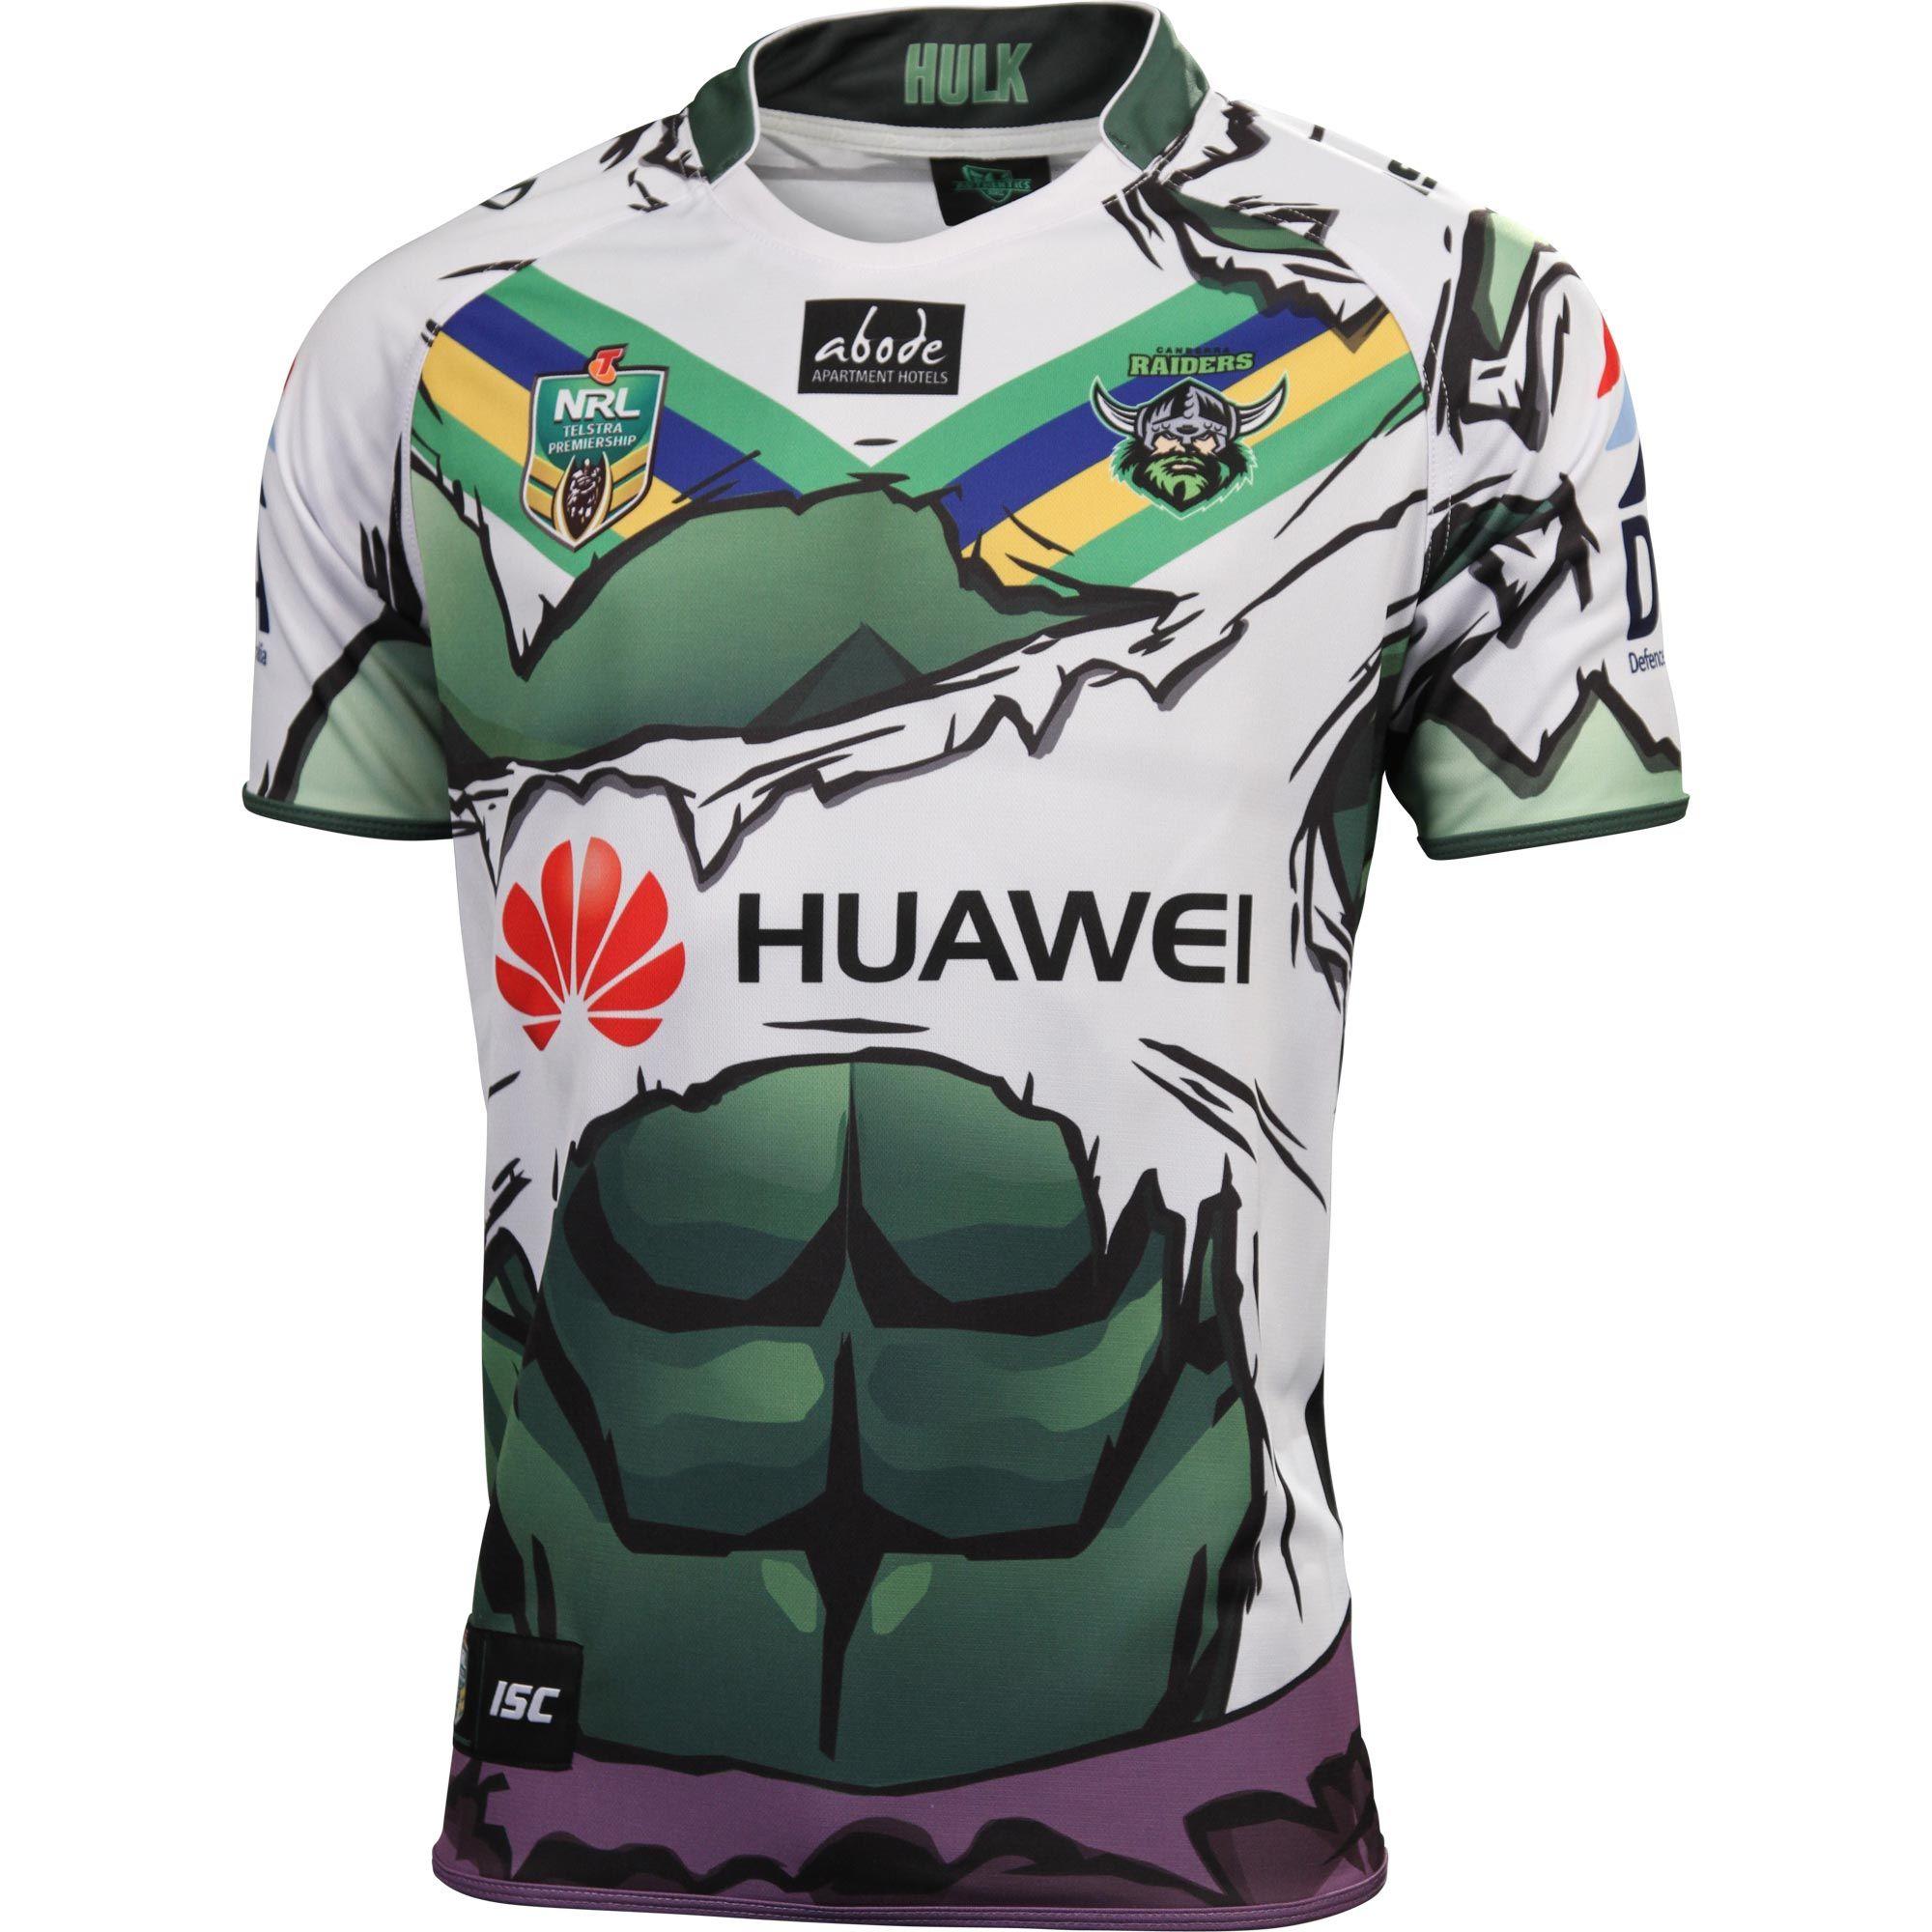 Canberra Raiders 2014 Men s Hulk Jersey - NRL Megastore  26d4073fc